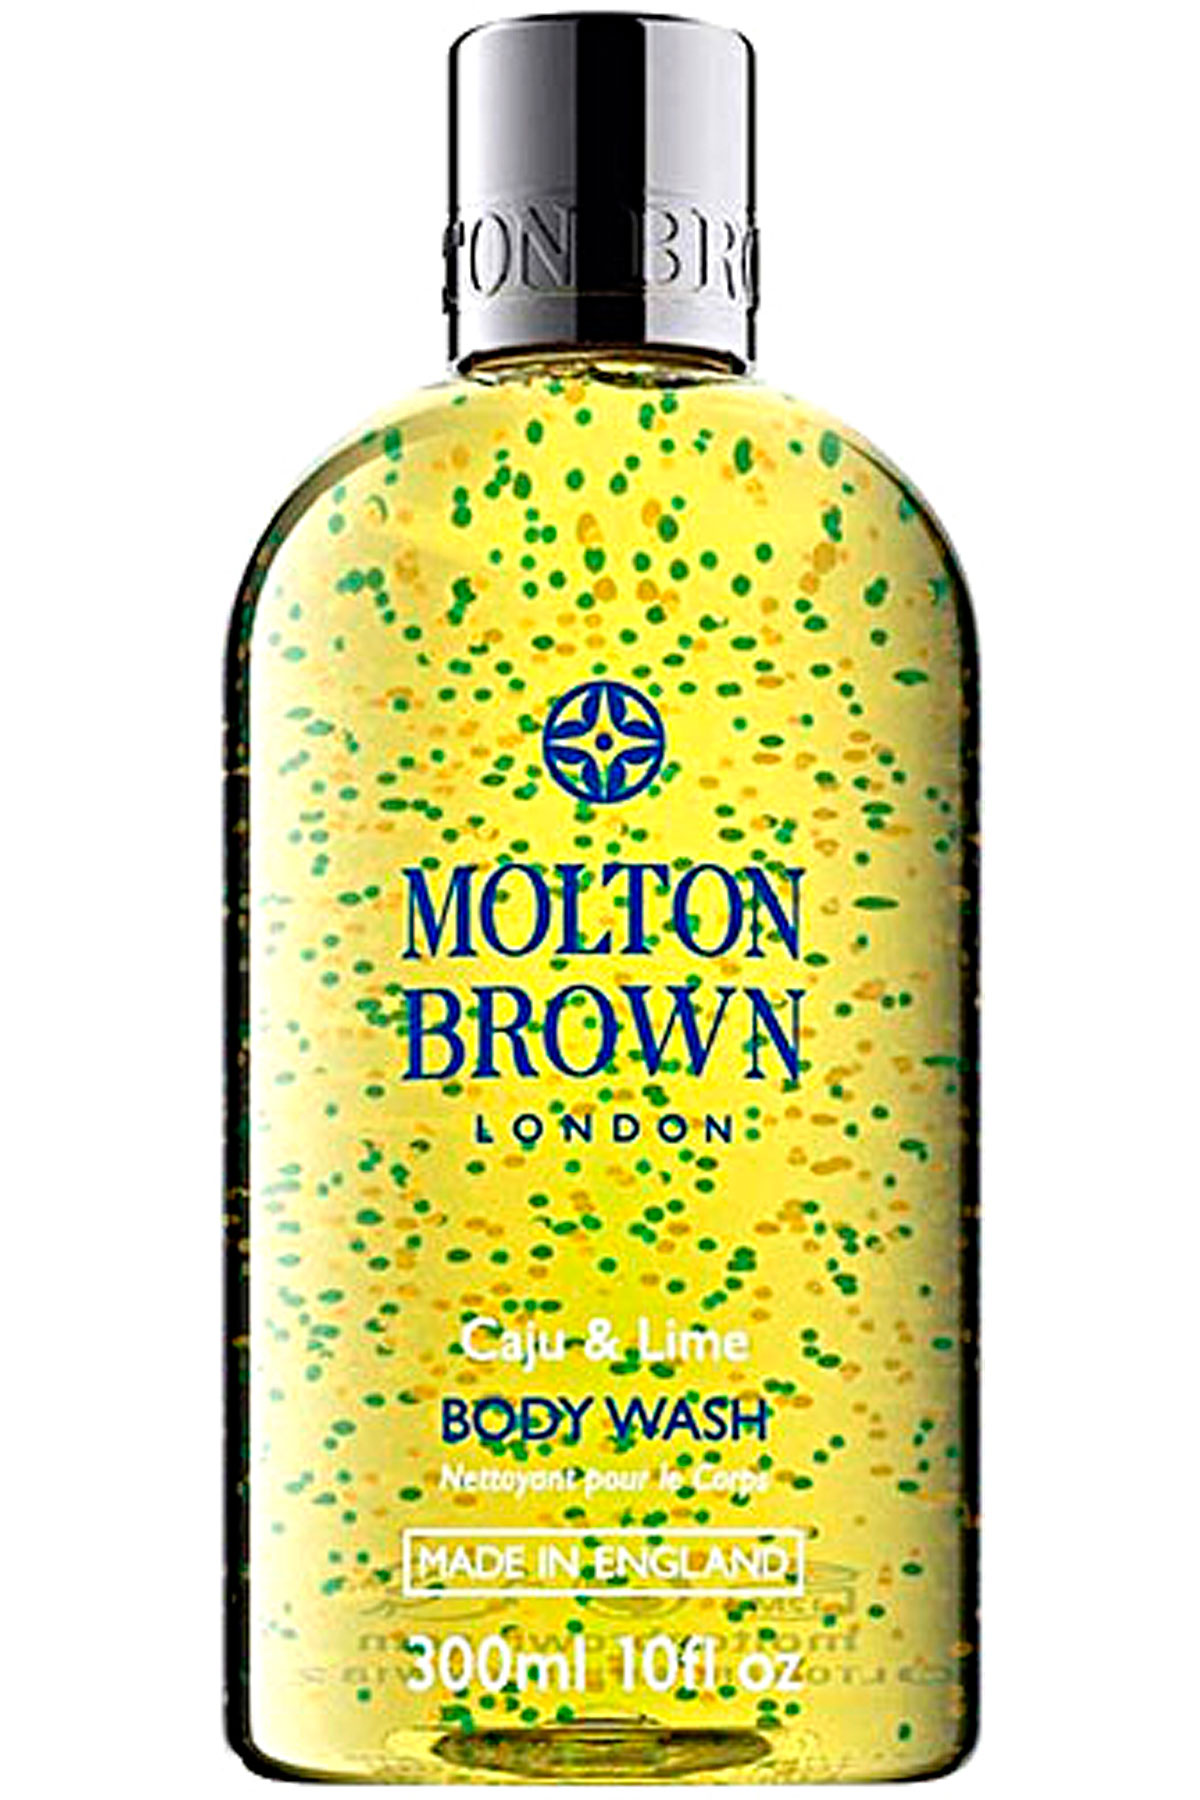 Molton Brown Beauty for Men, Caju & Lime - Body Wash - 300 Ml, 2019, 300 ml